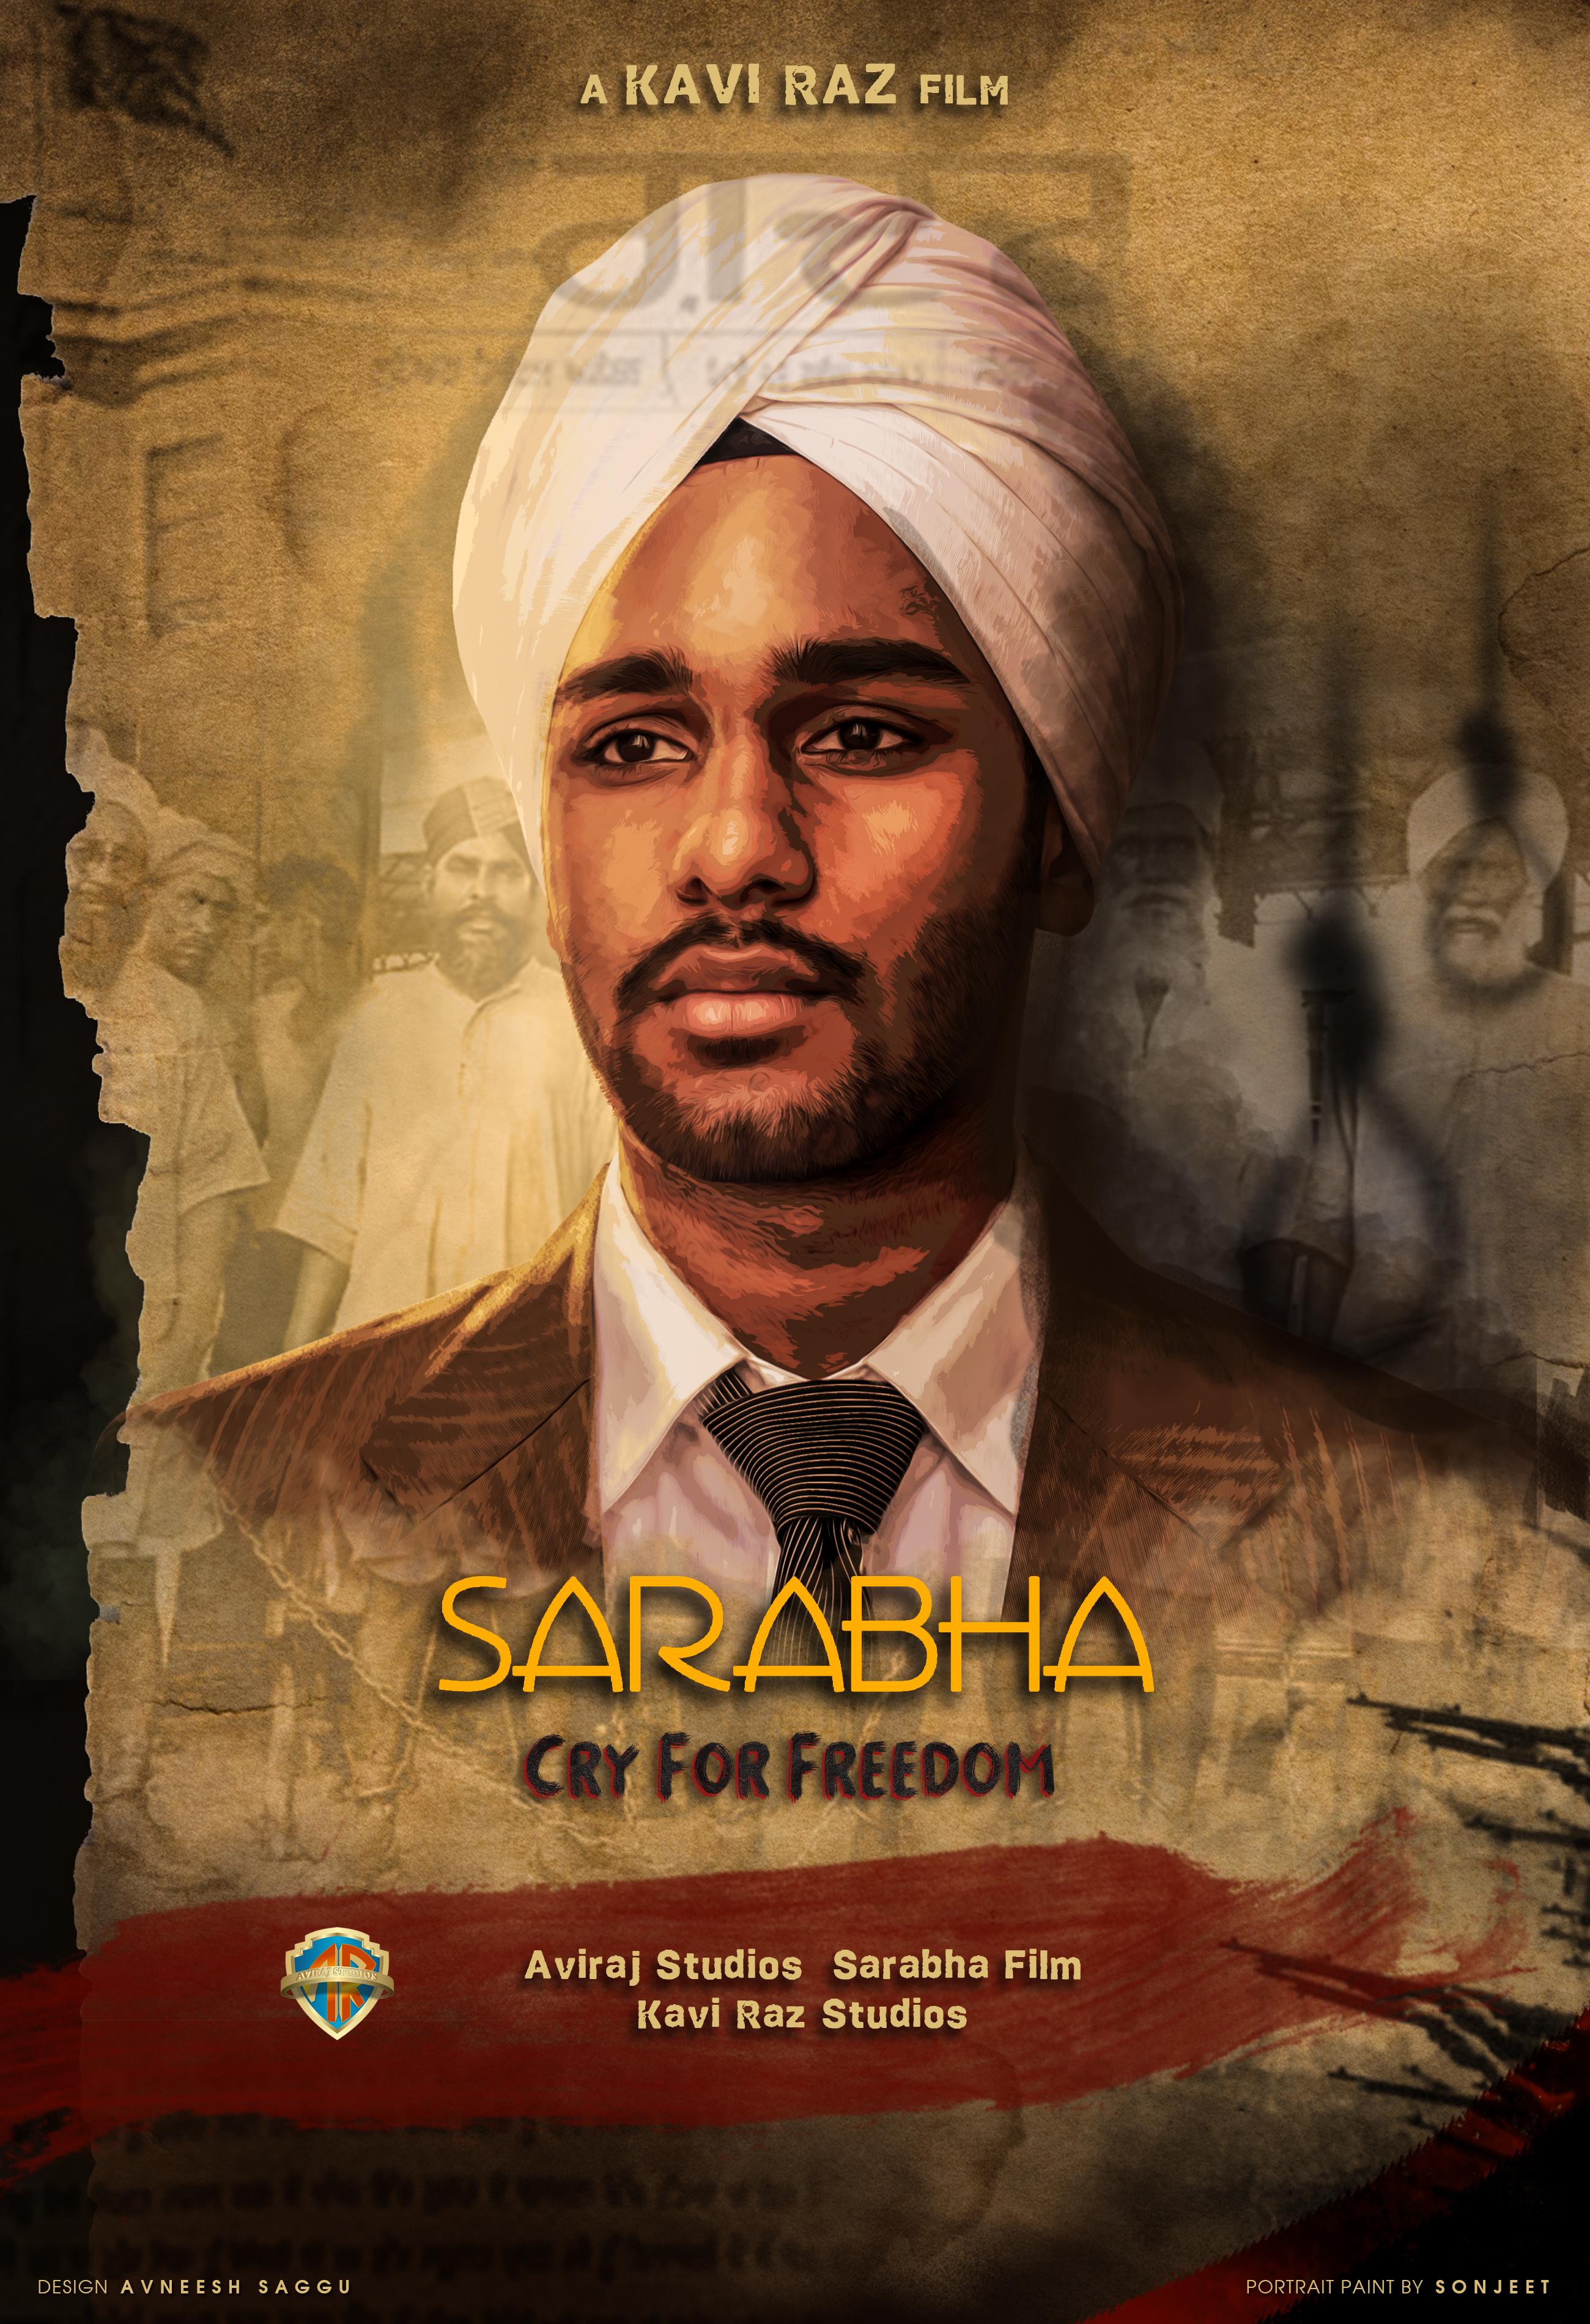 Sarabha Cry For Freedom 2019